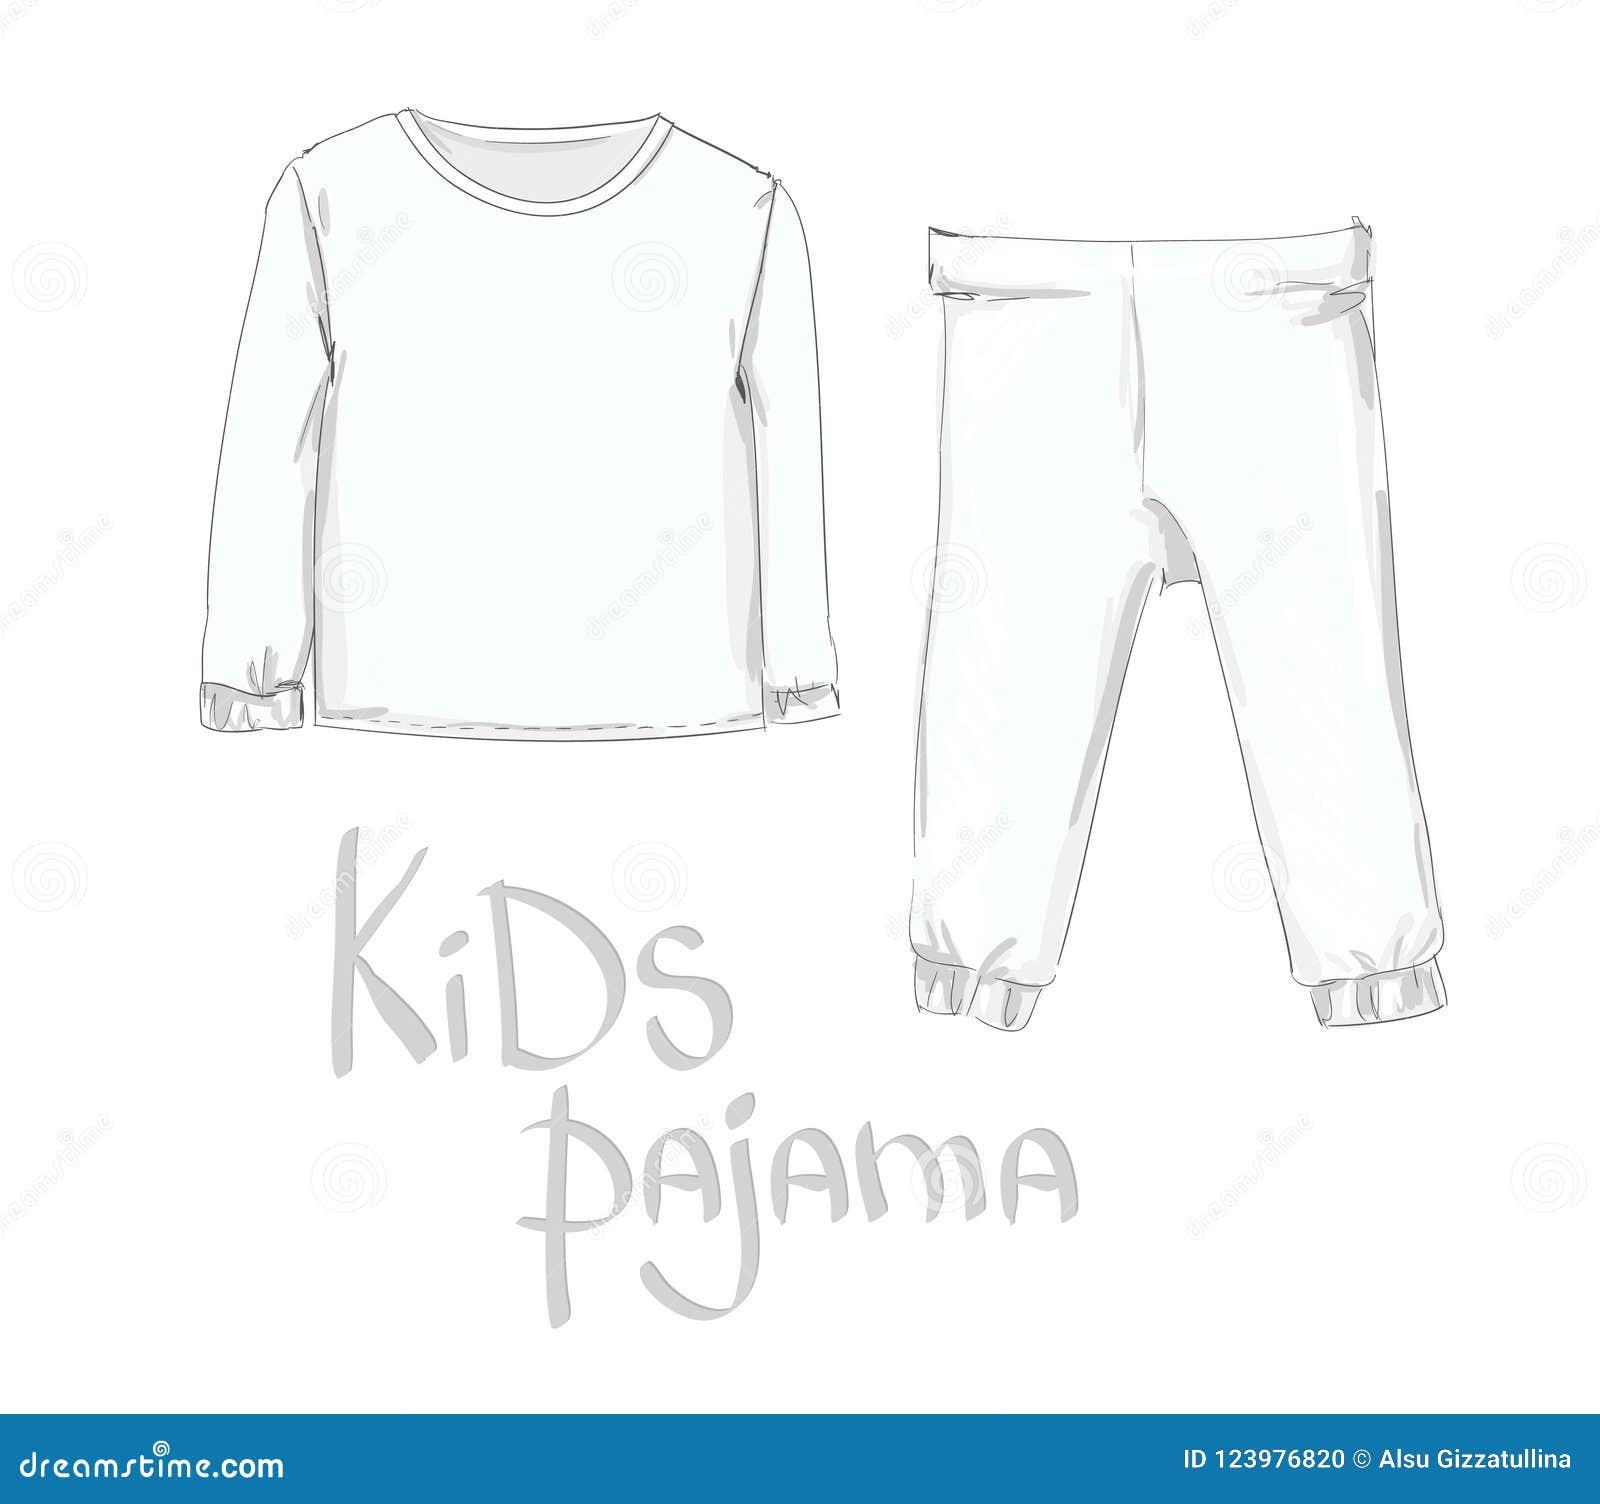 hand drawn kids pajama fashion baby clothing stock vector